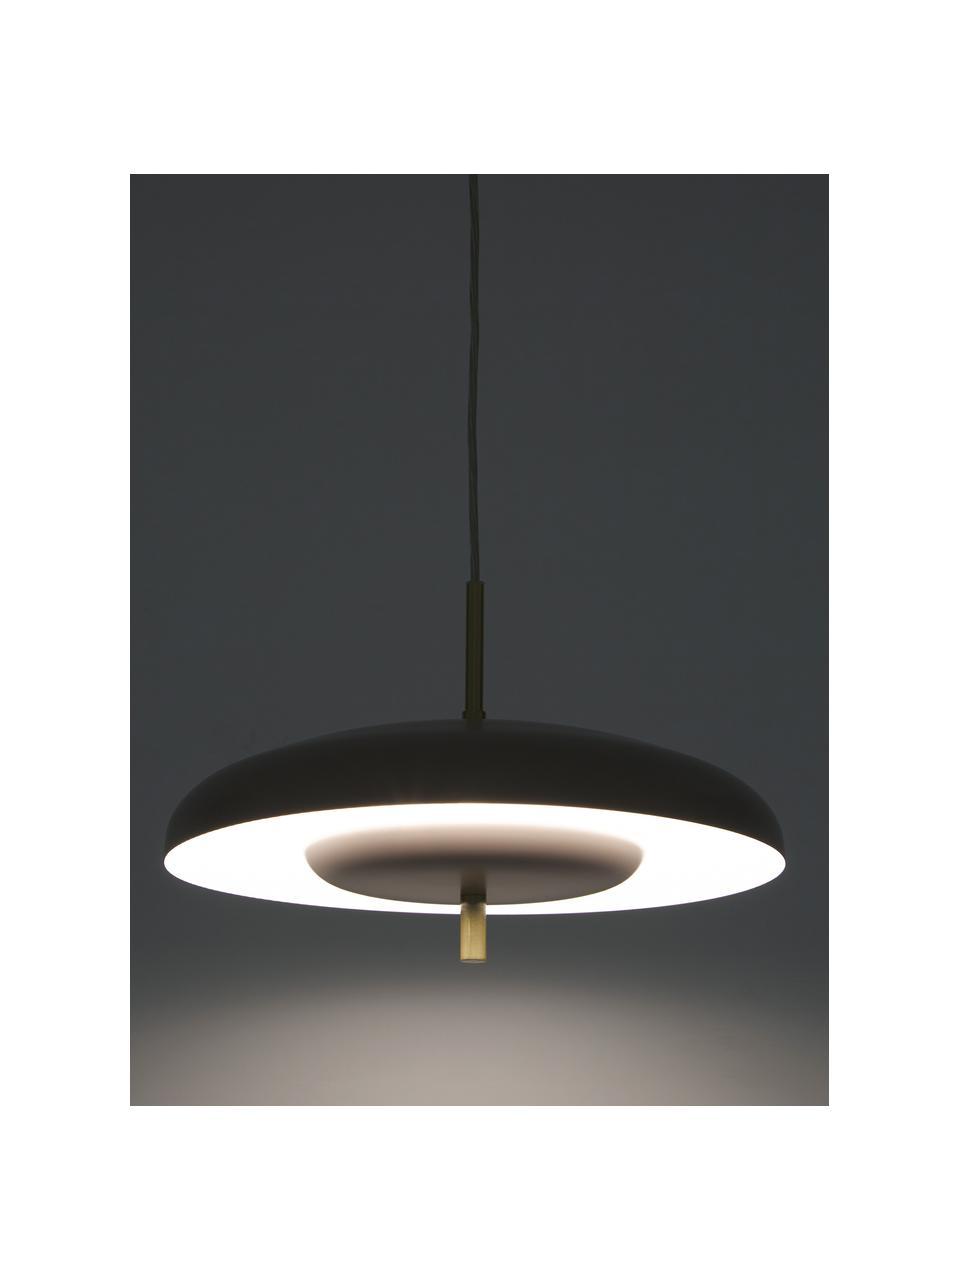 Lampa wisząca scandi Mathea, Taupe, Ø 38 x W 8 cm